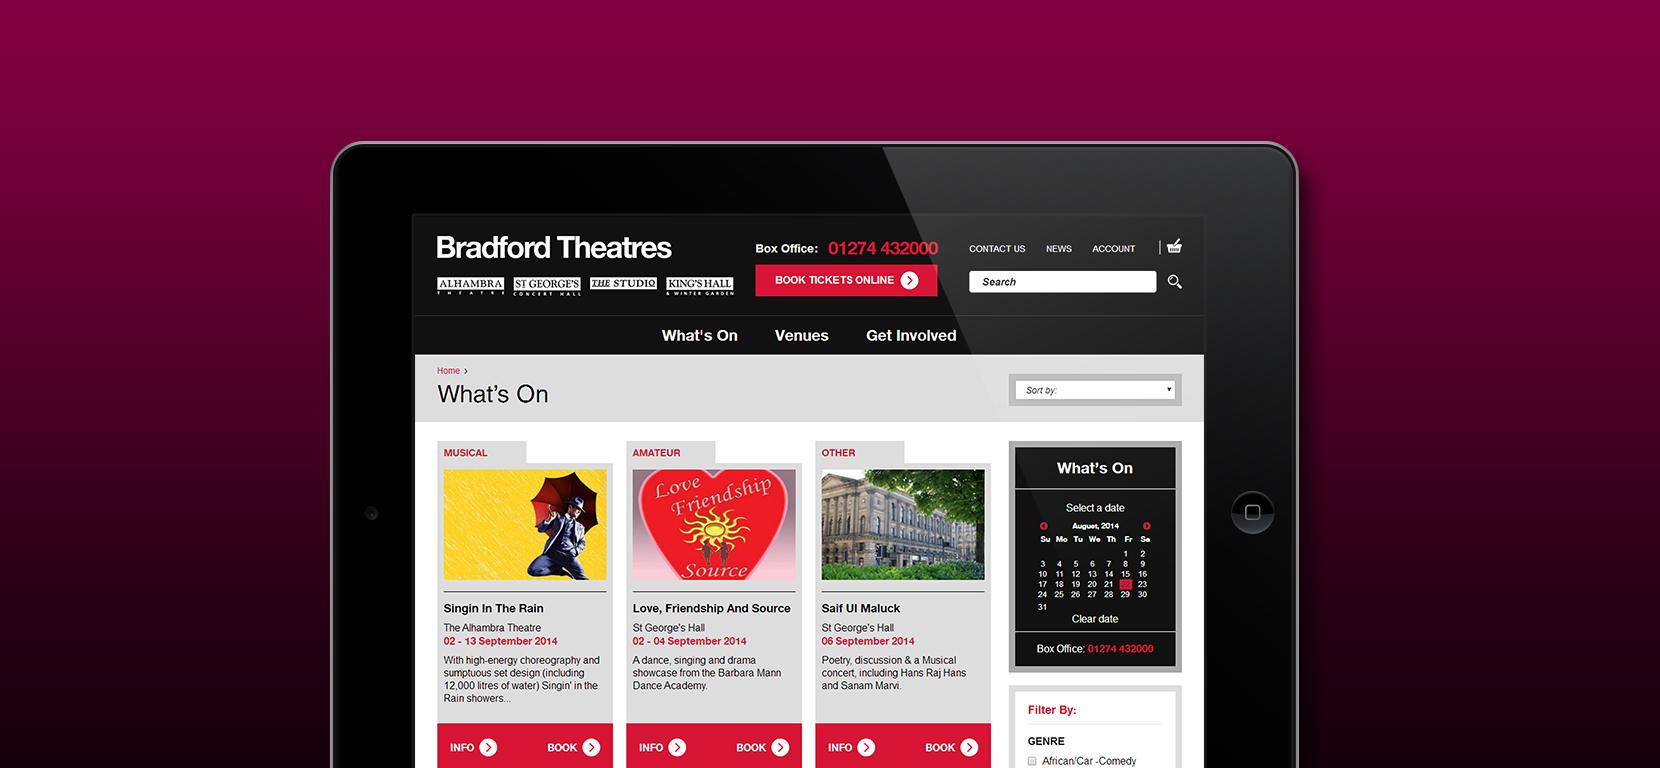 Bradford Theatres - responsive mobile designs